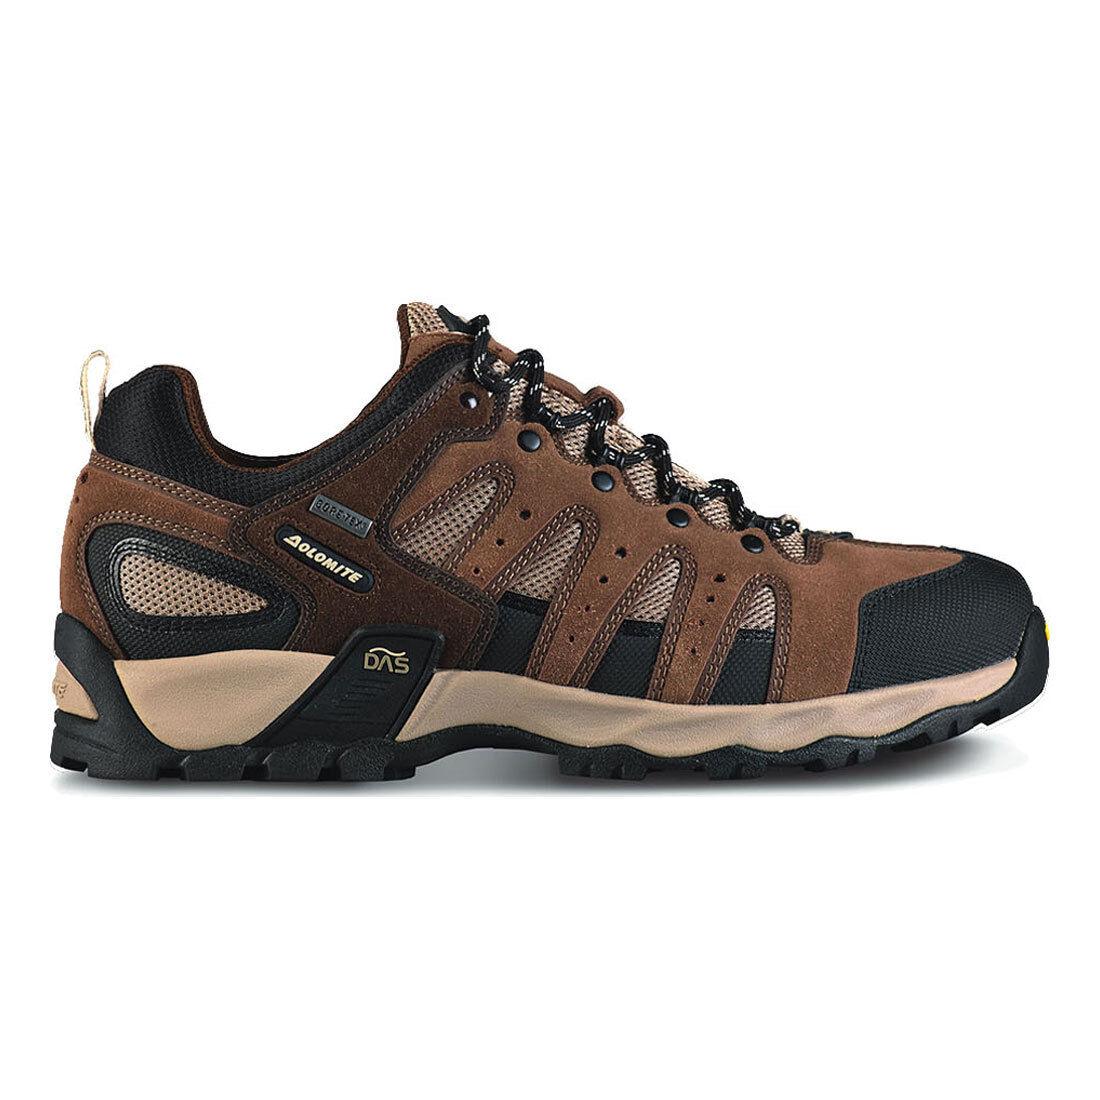 Schuhe basse Trekking Approach Escursionismo DOLOMITE SPARROW LOW GTX